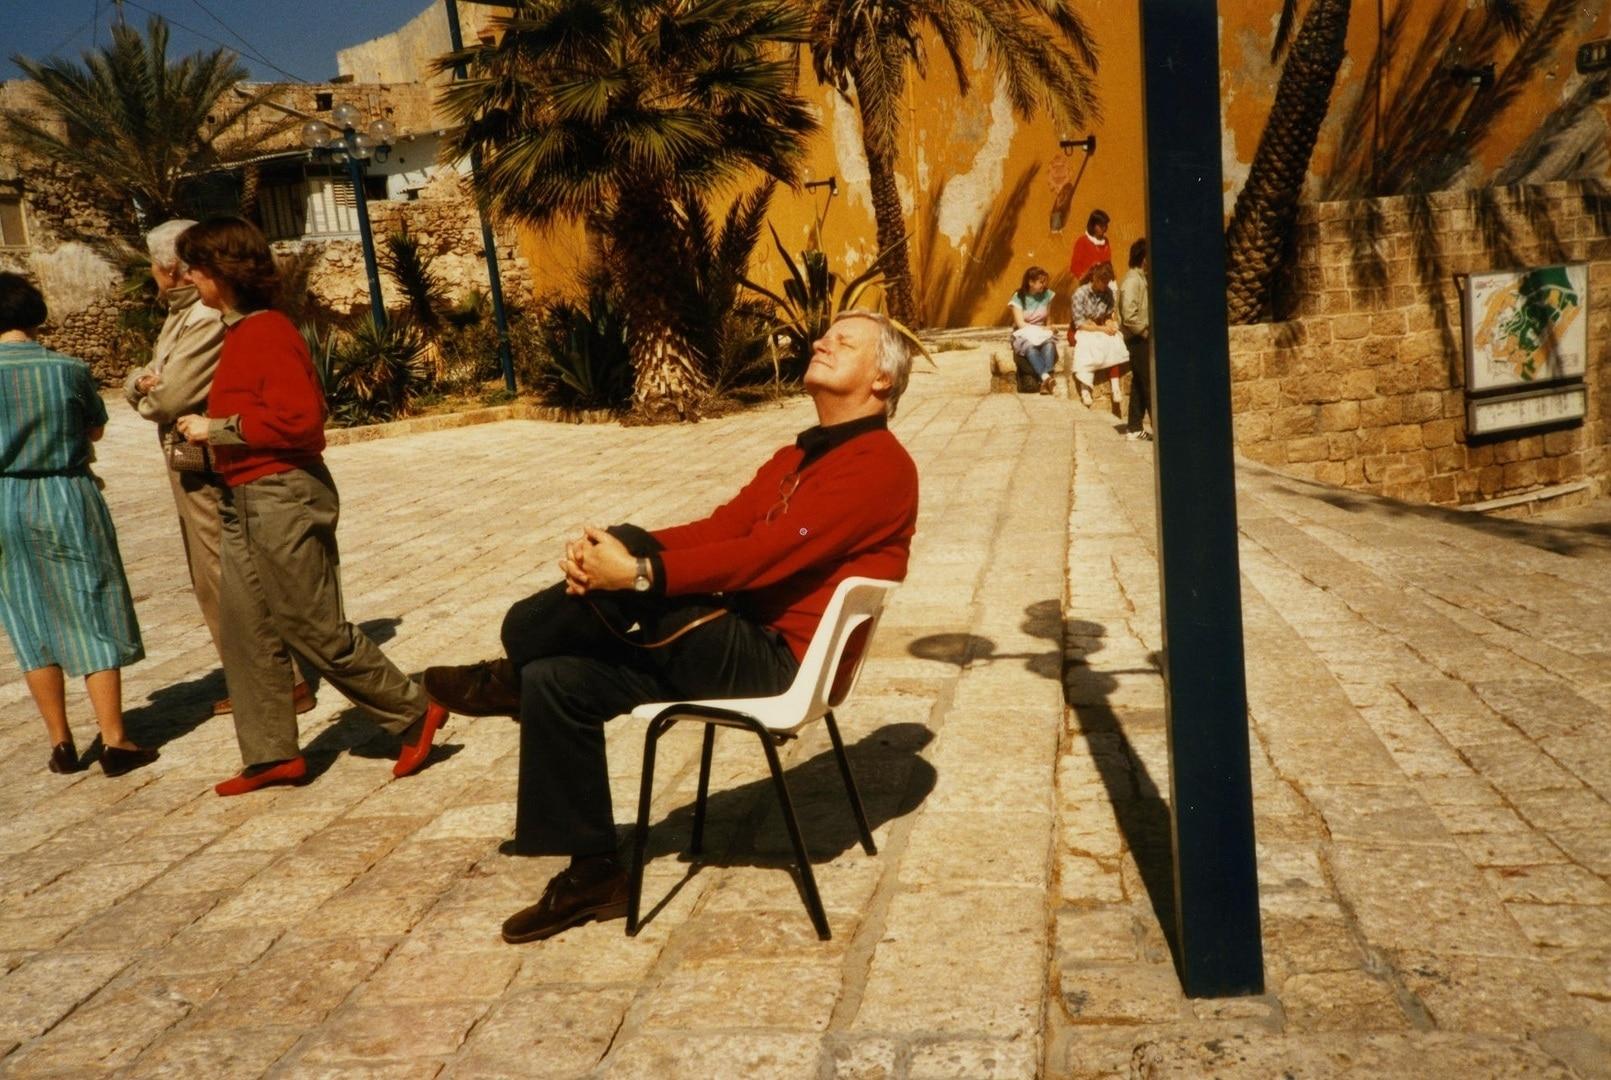 Grundmann - Jaffa - 1985 - Bild privat.jpg